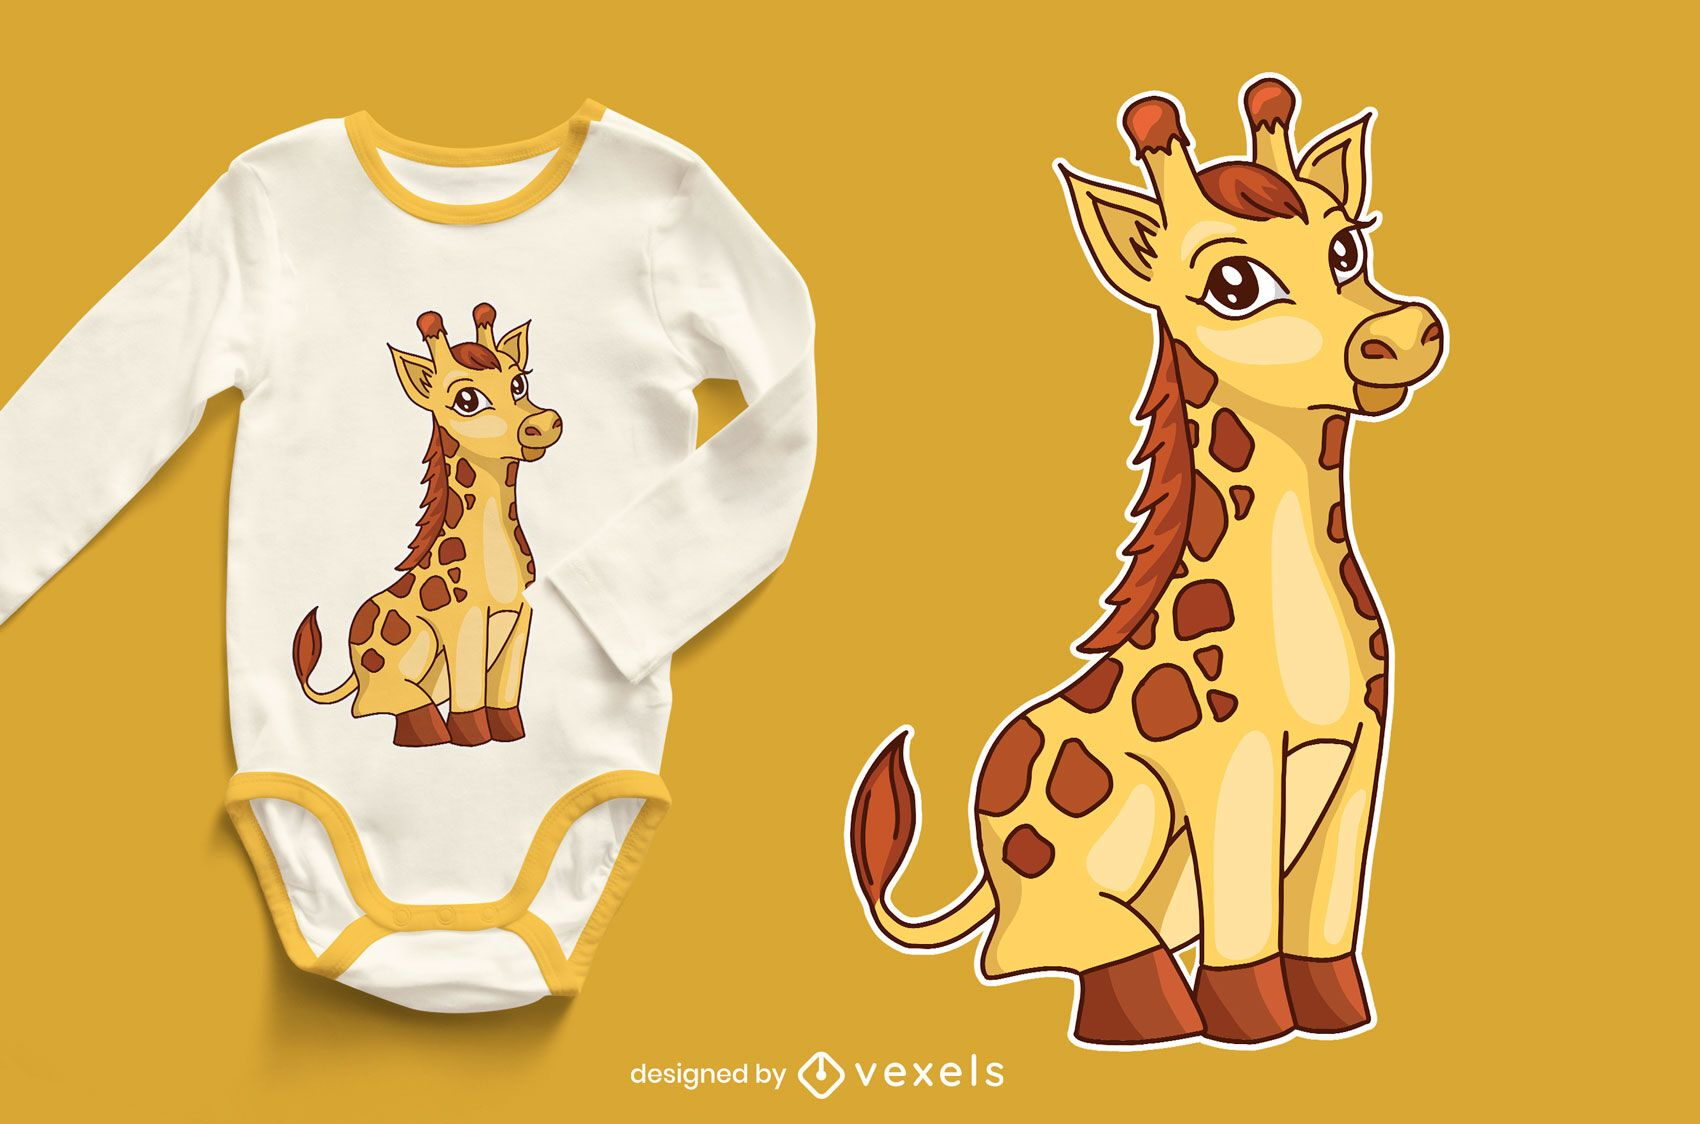 Cute baby giraffe t-shirt design